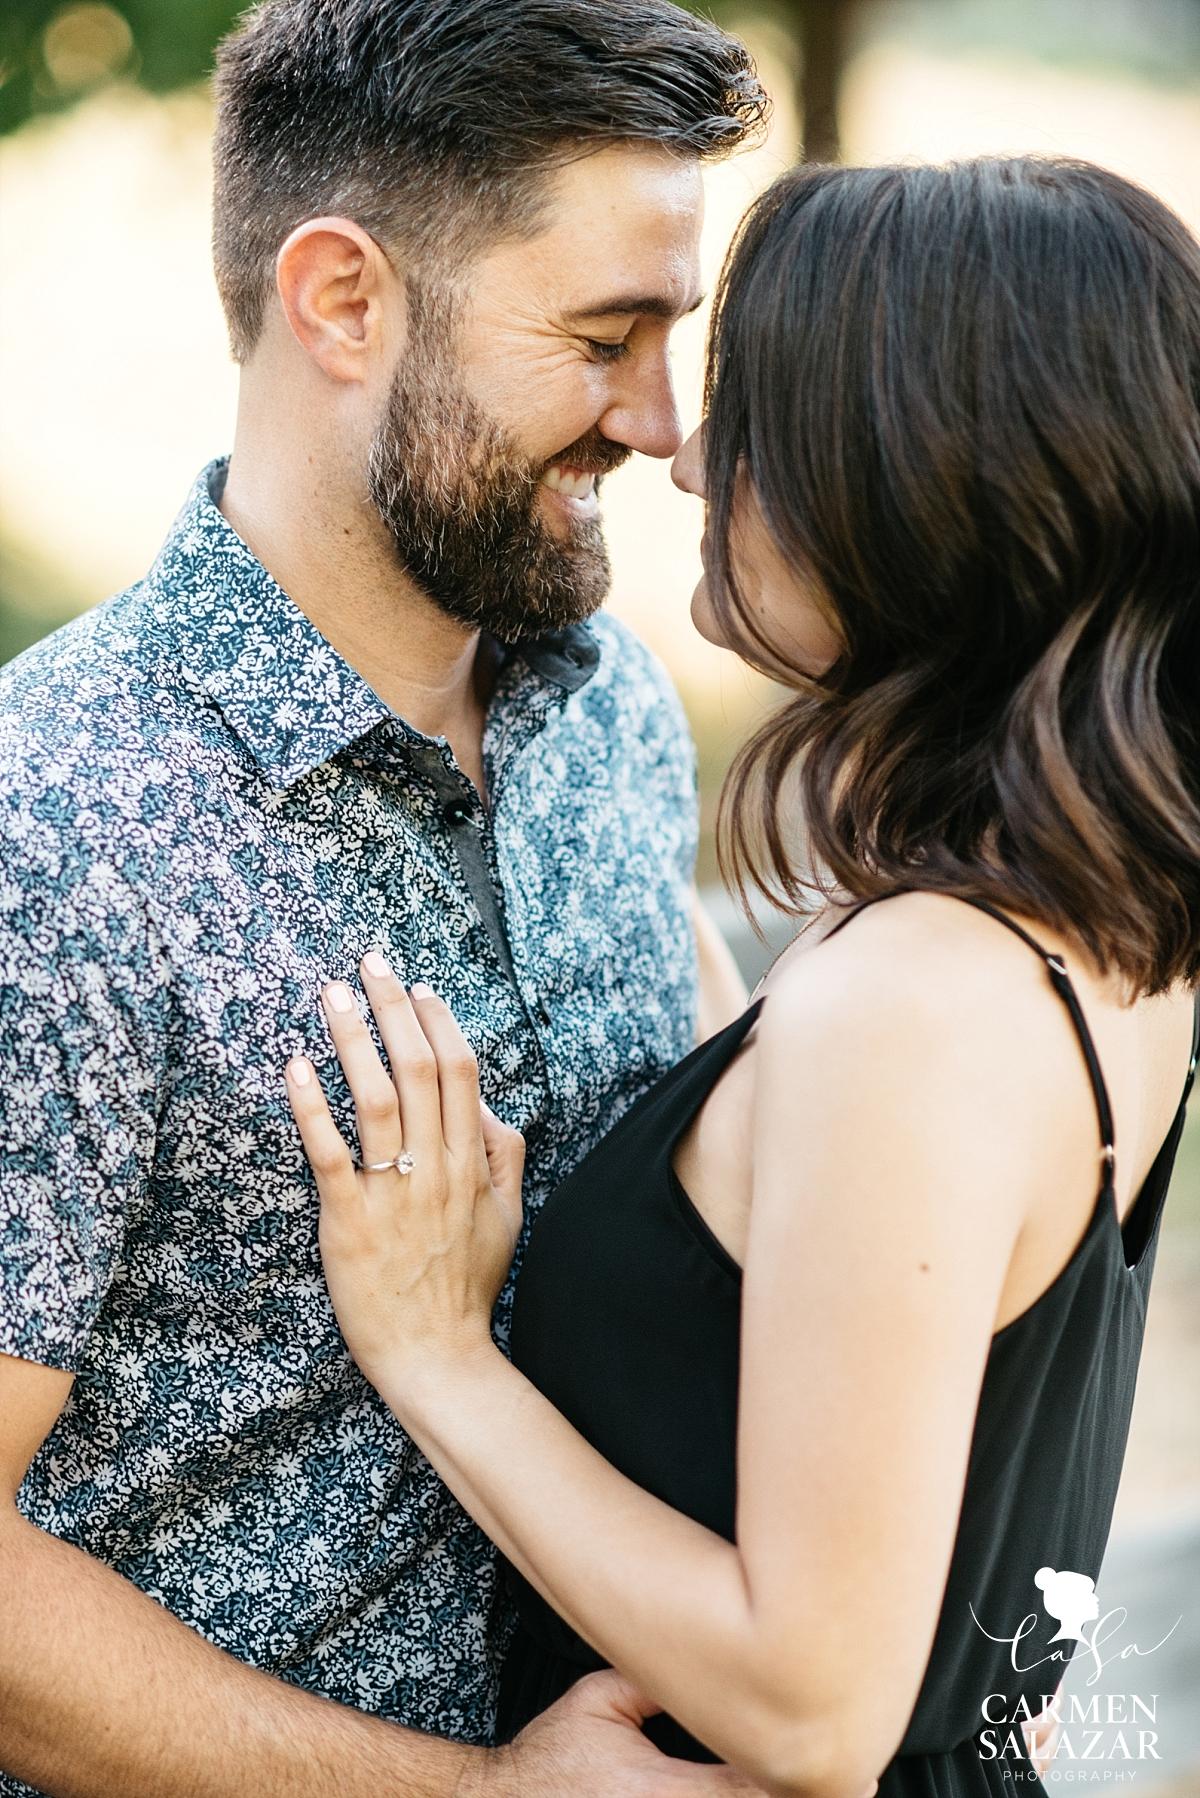 Intimate California engagement portraits - Carmen Salazar